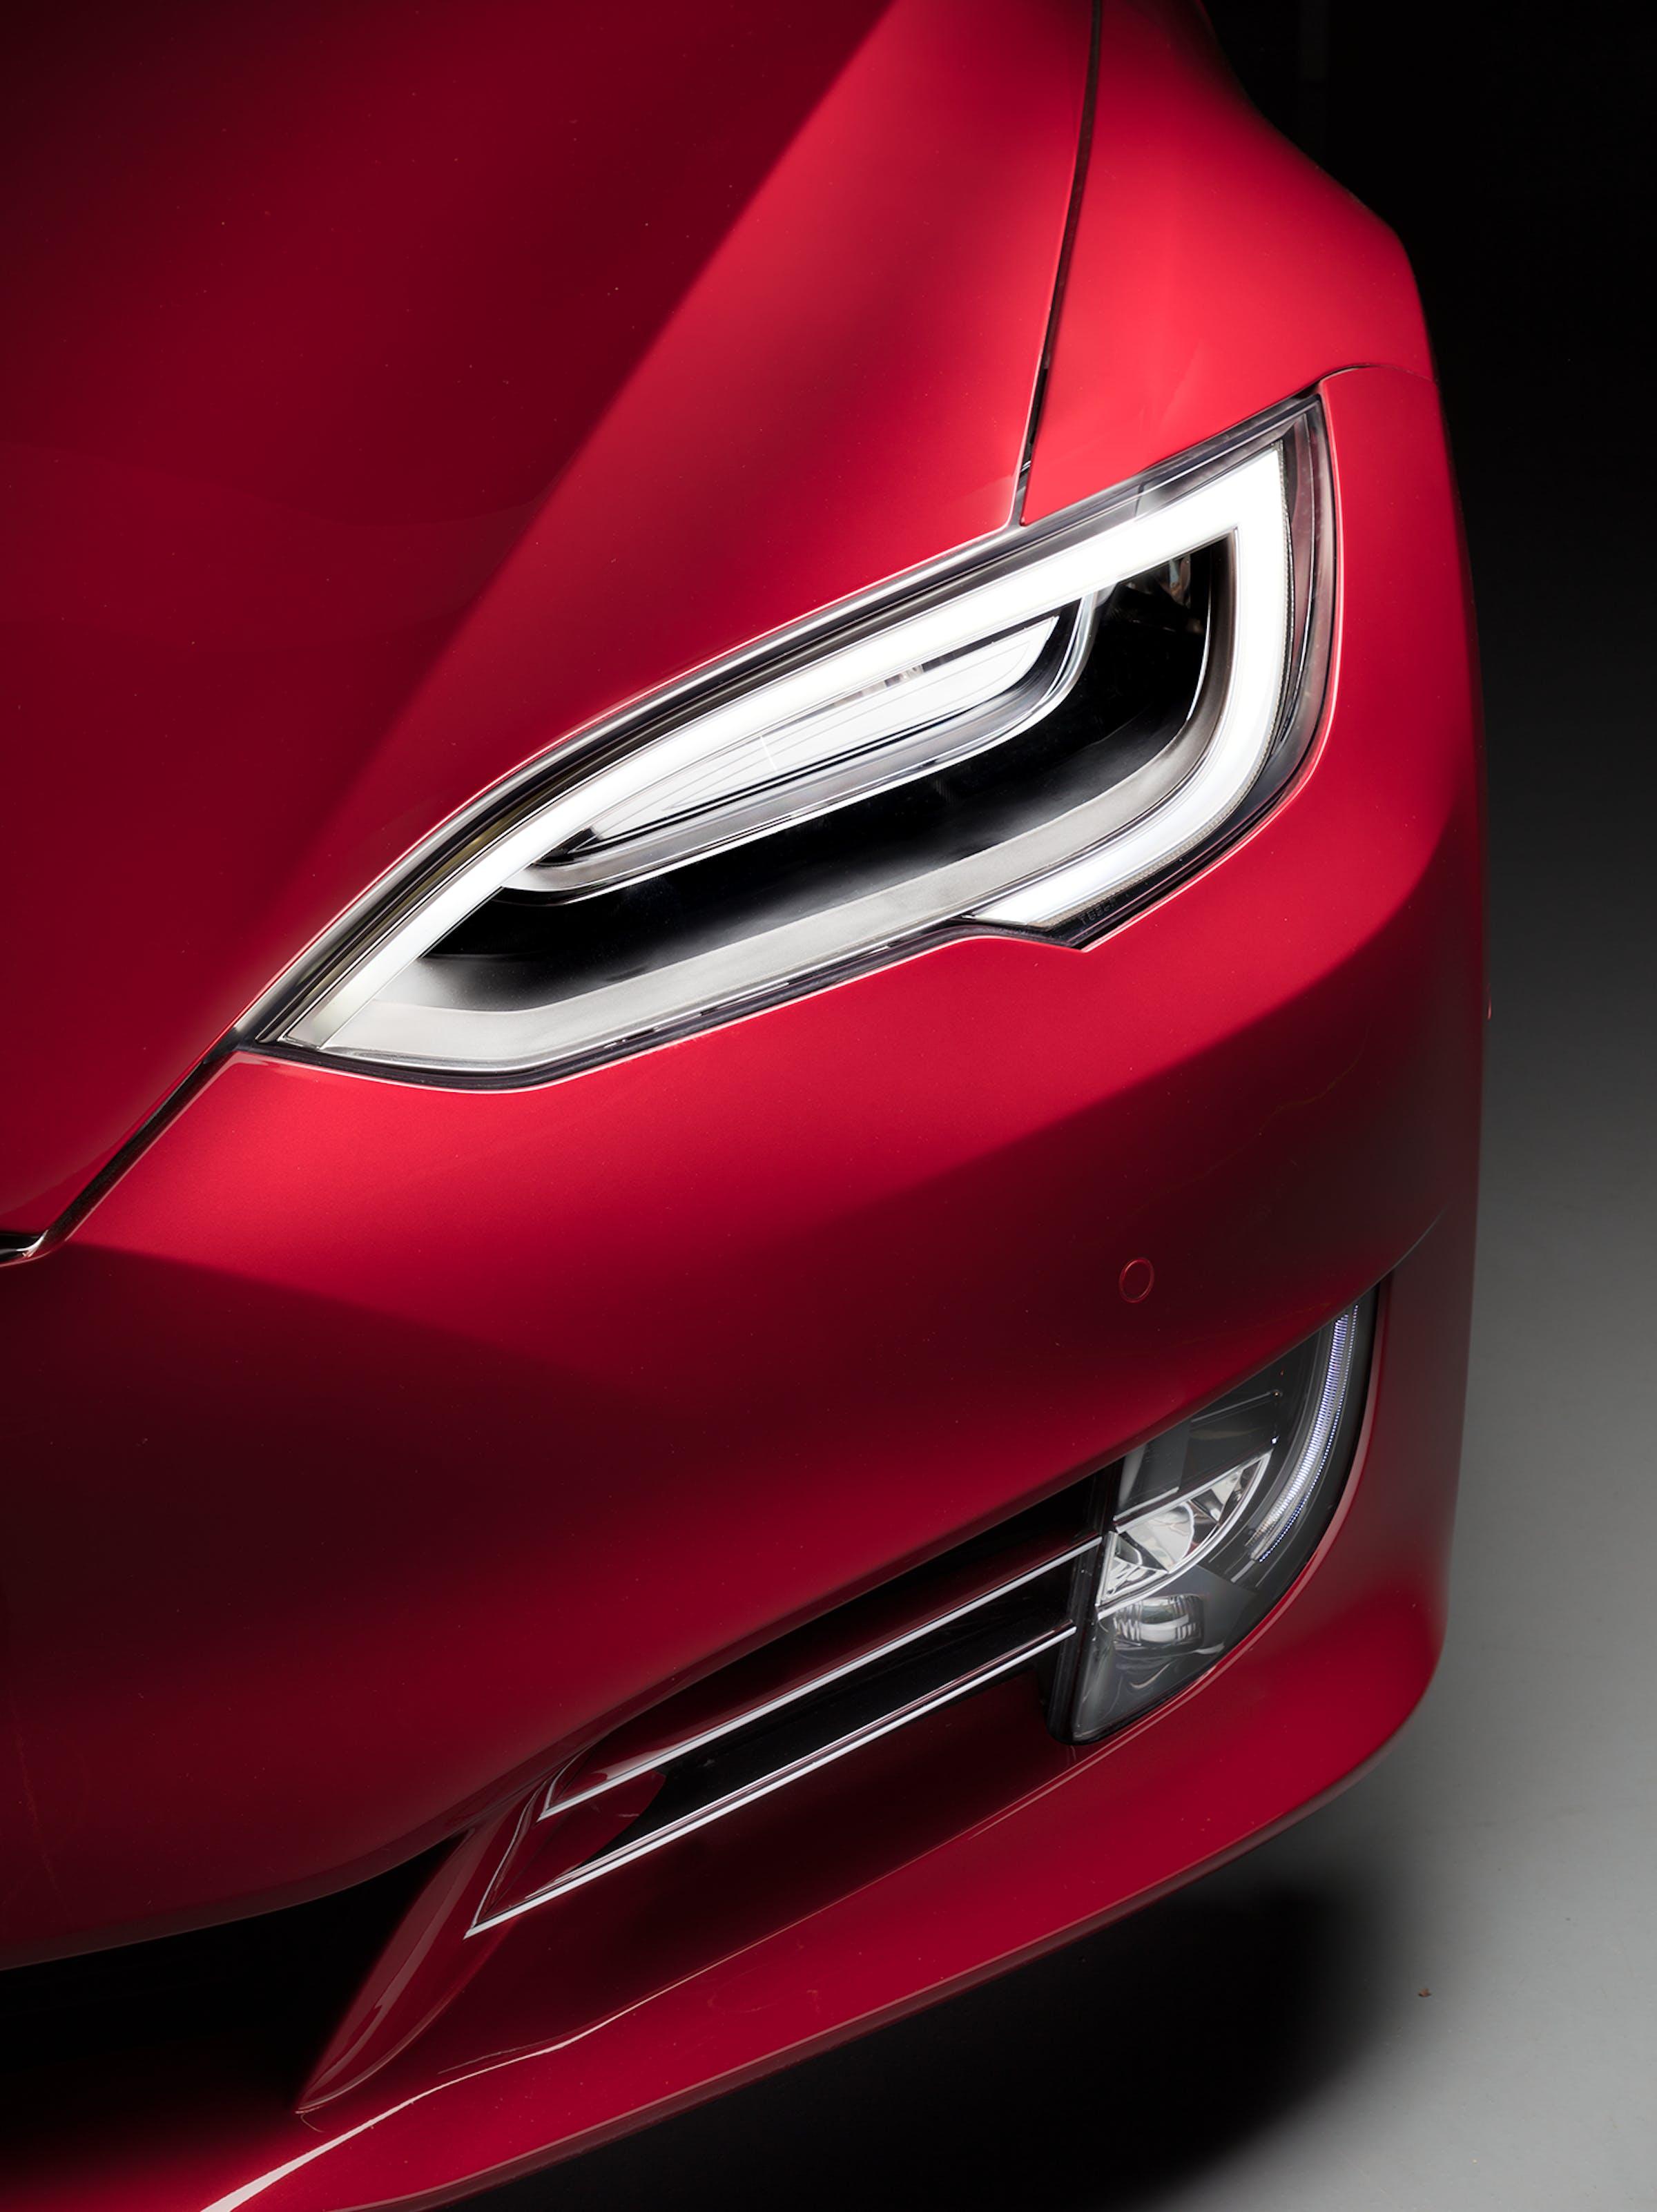 Tesla Model S headlight